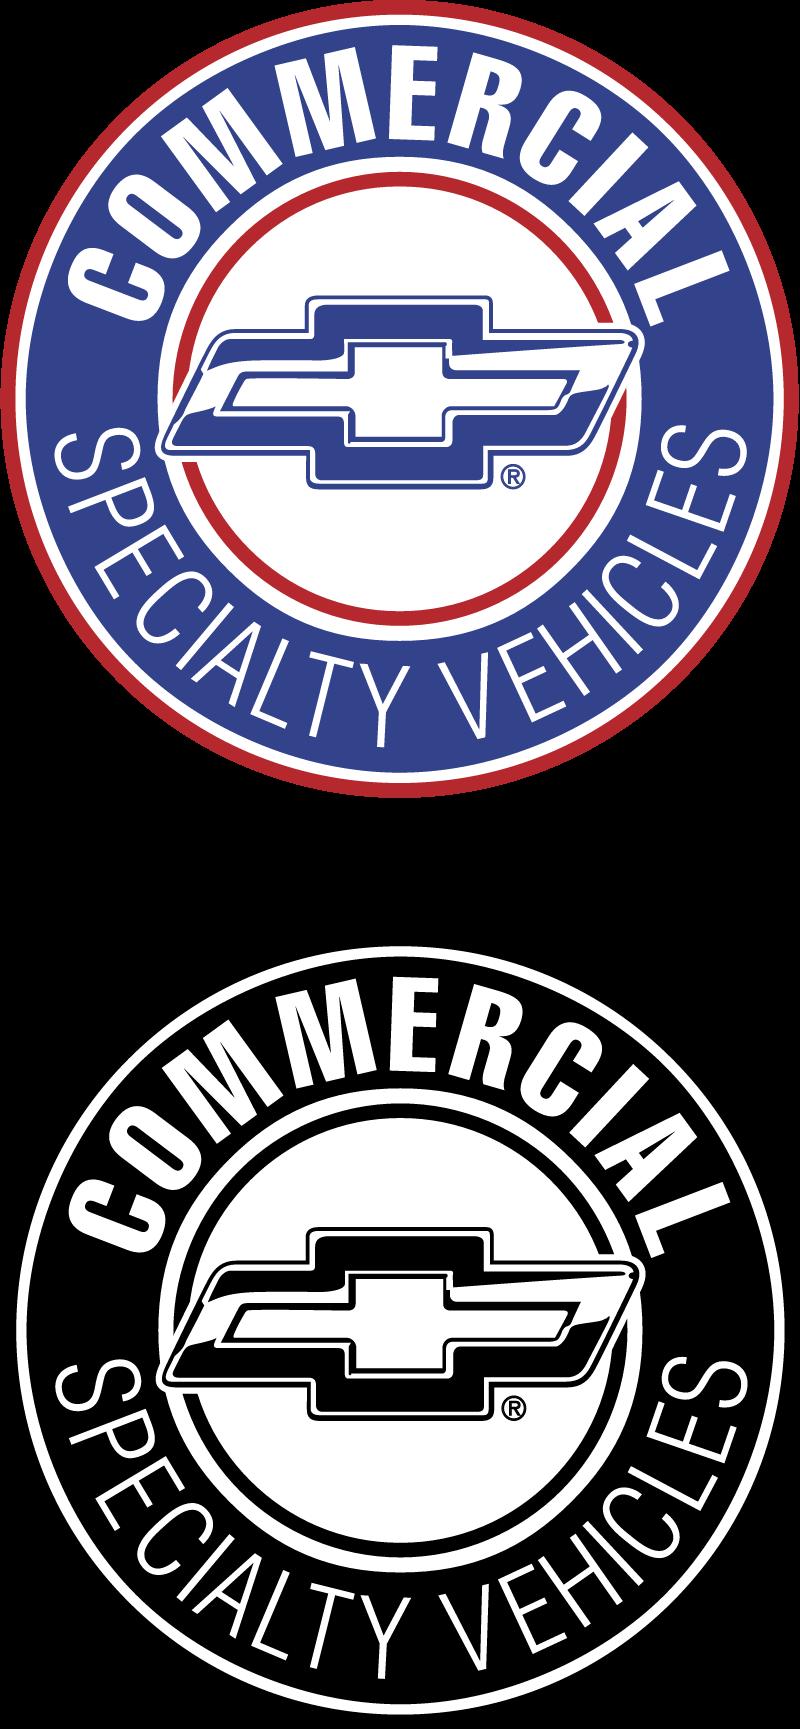 Chevy Specialty Vehicles vector logo